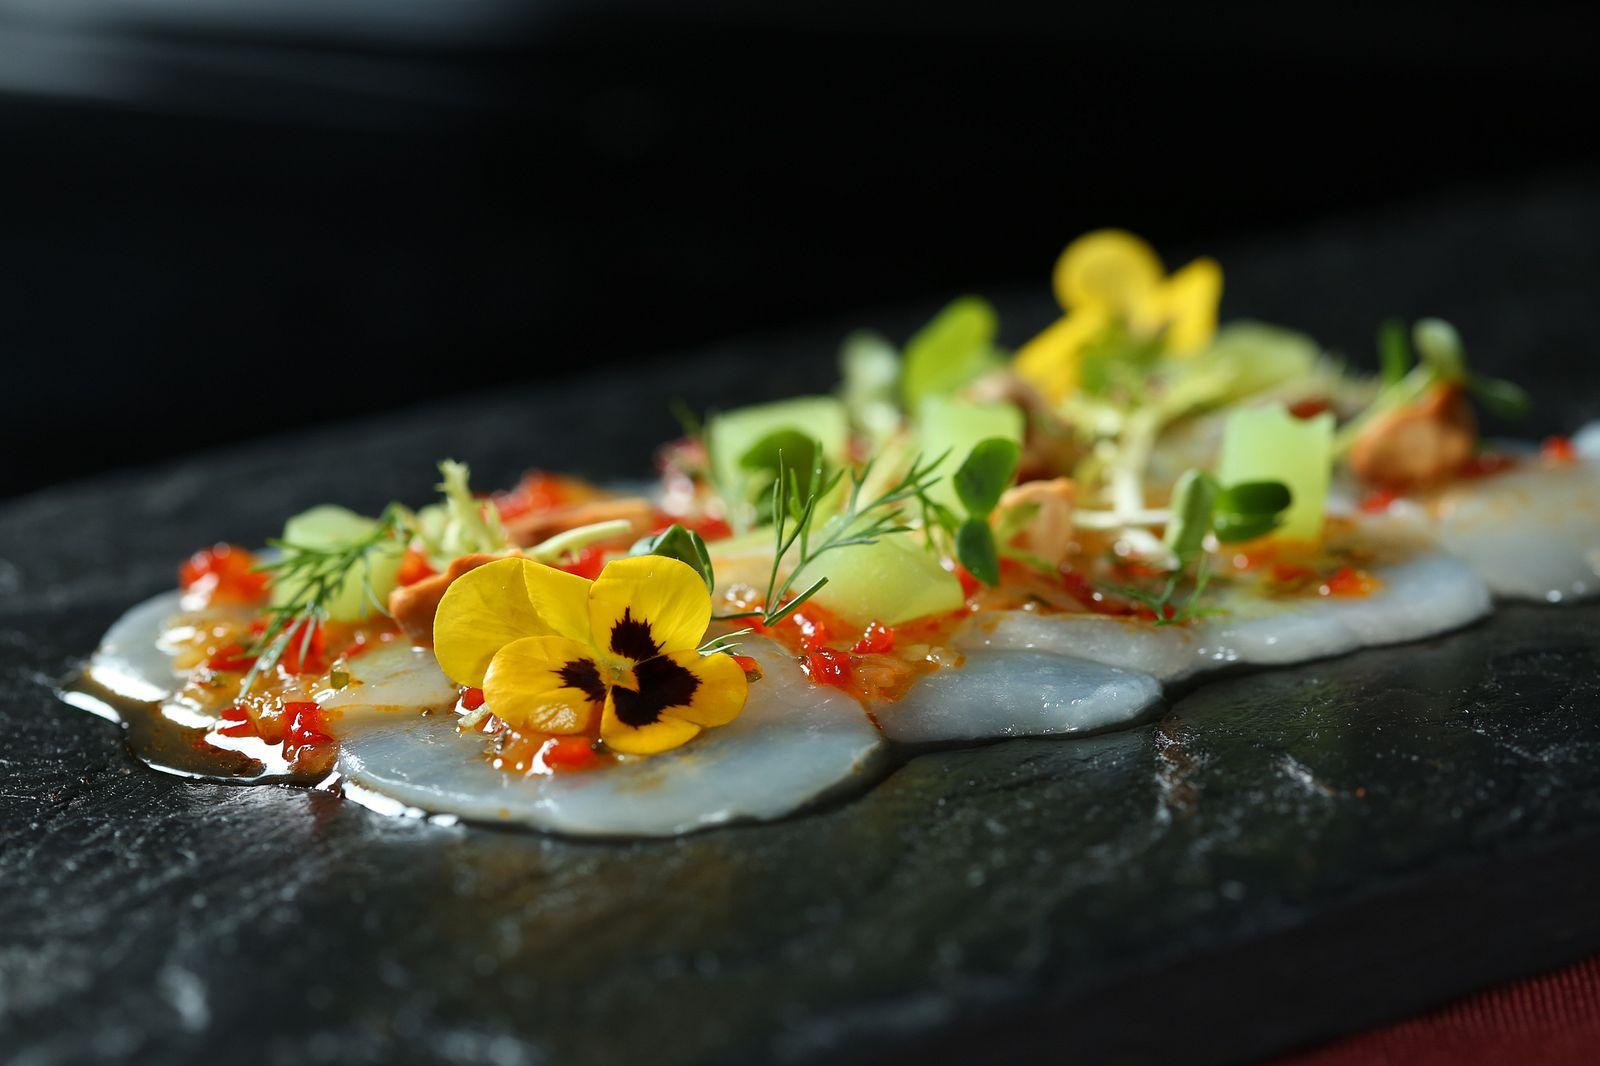 From Fatty Bluefin Tuna Belly to A5 Hitachi Wagyu, the